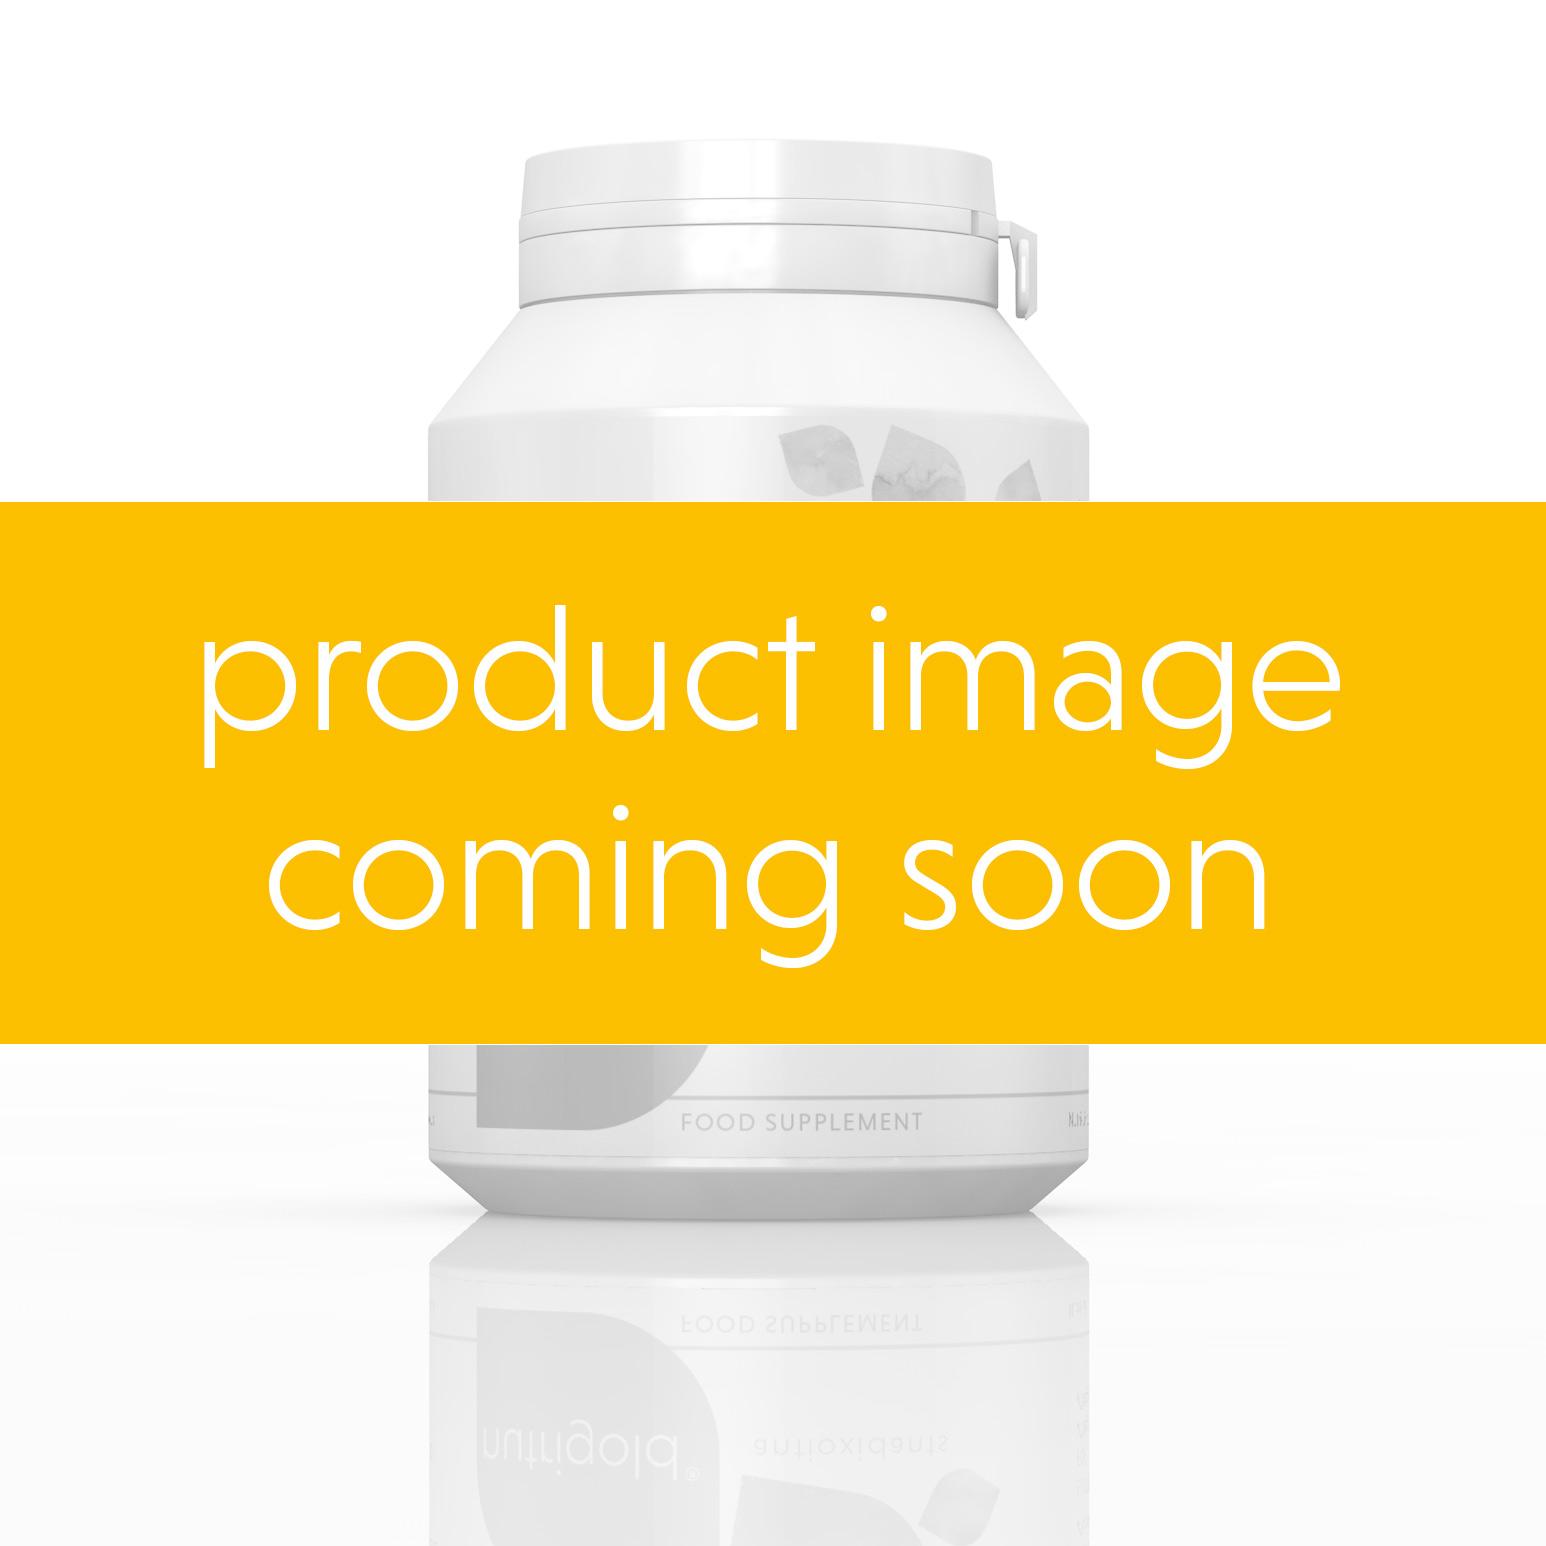 Pregnancy Supplement Pack